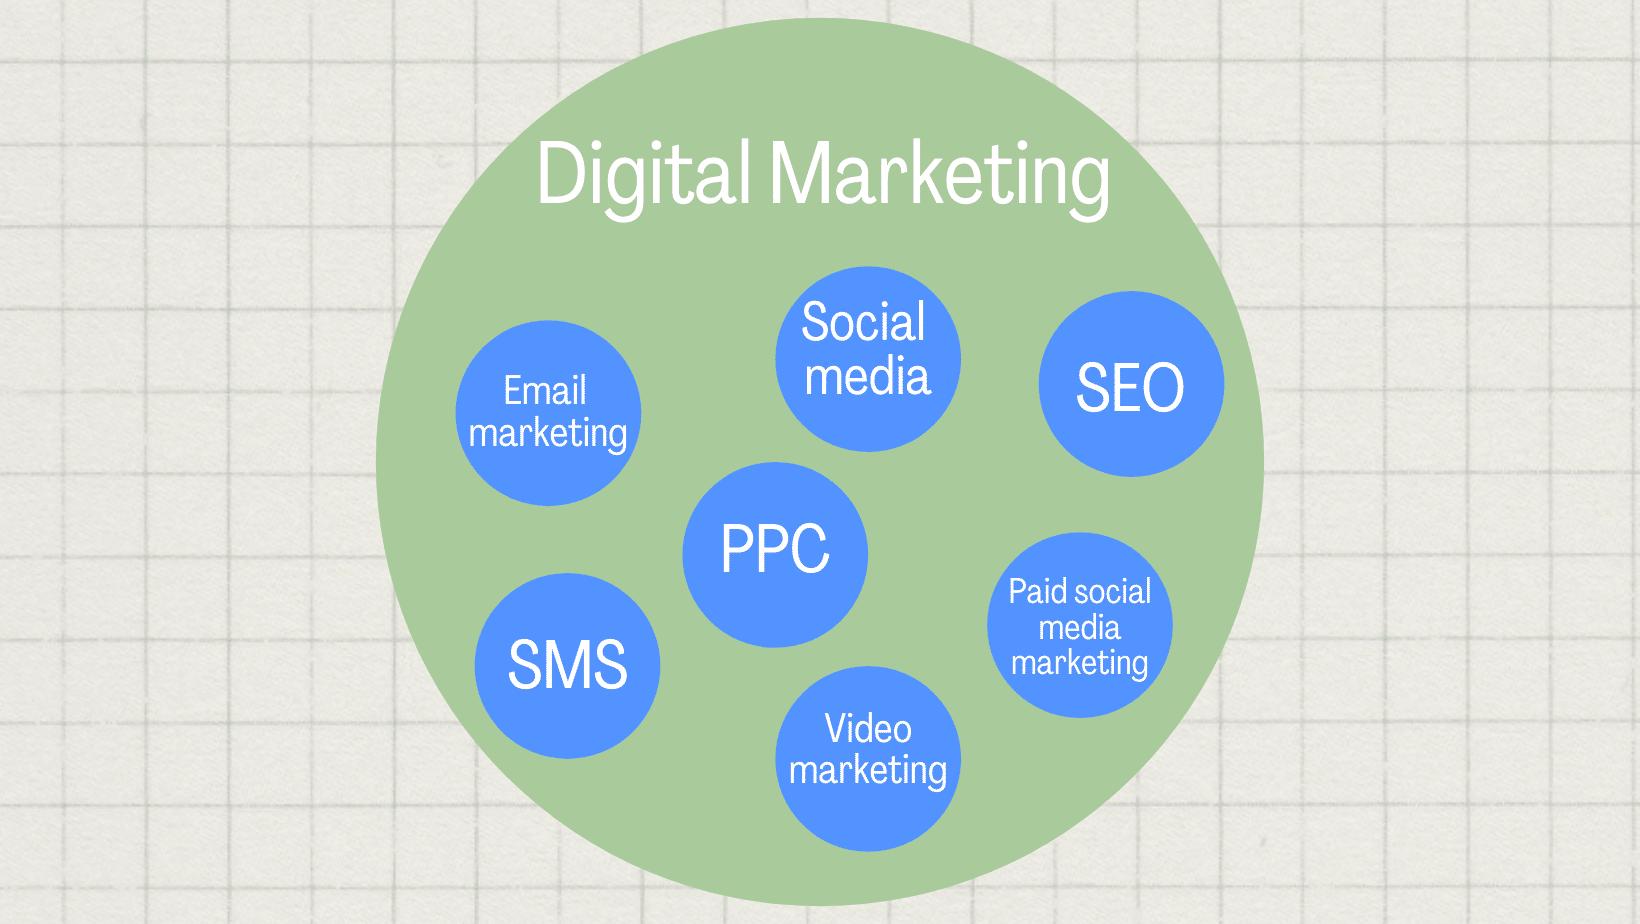 sms, ppc, email marketing, video marketing, paid social media marketing, SEO, social media all within digital marketing